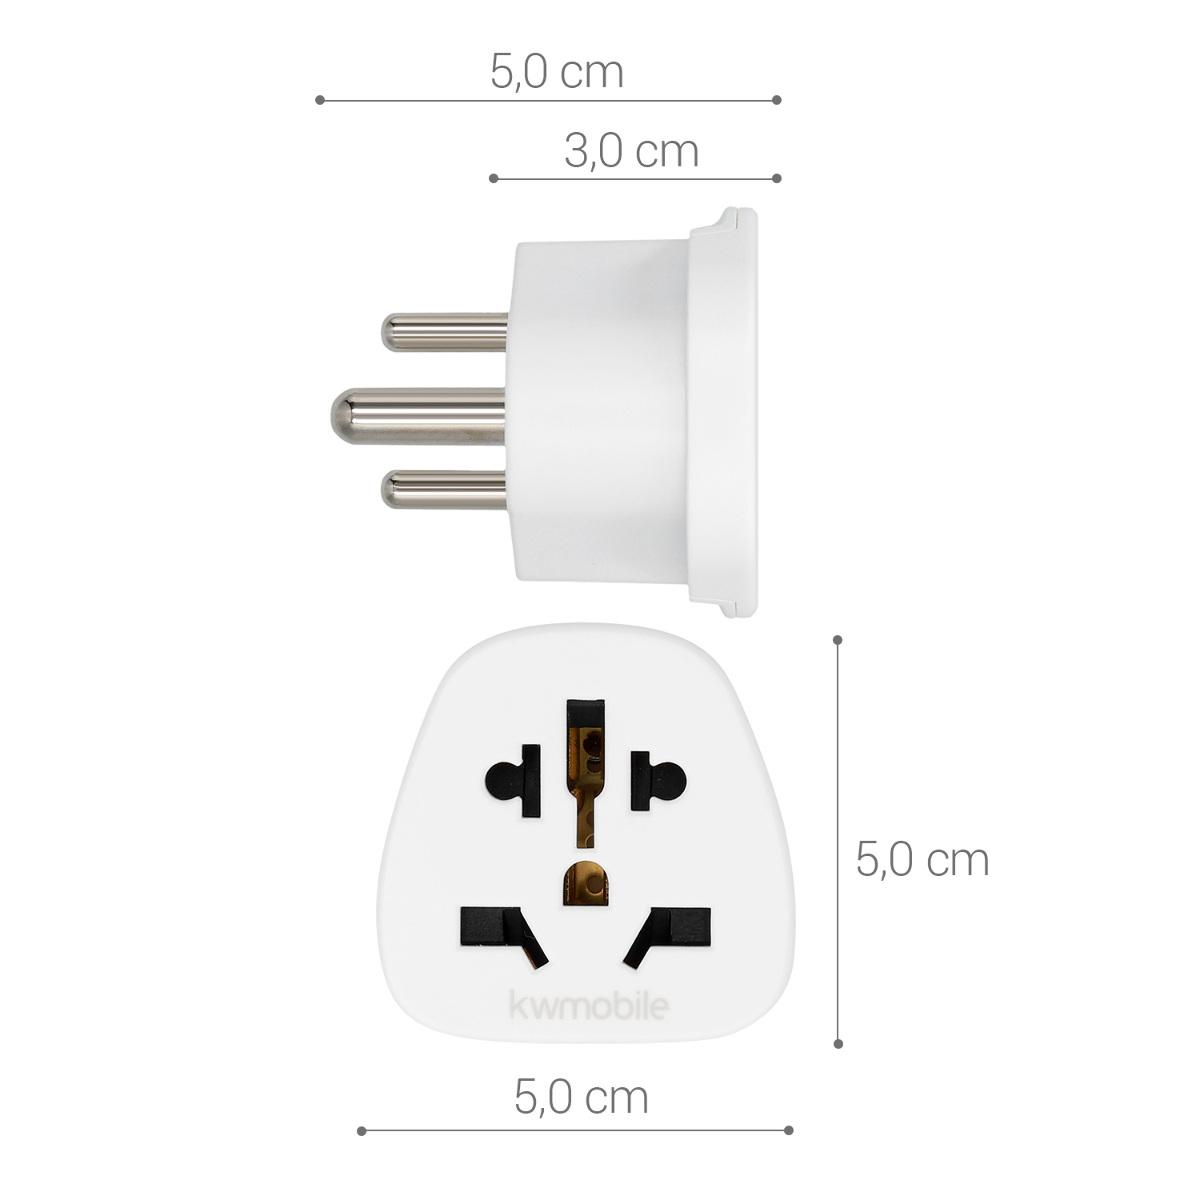 2x reise adapter typ d reiseadapter zu typ d steckdose stecker sri lanka indien ebay. Black Bedroom Furniture Sets. Home Design Ideas